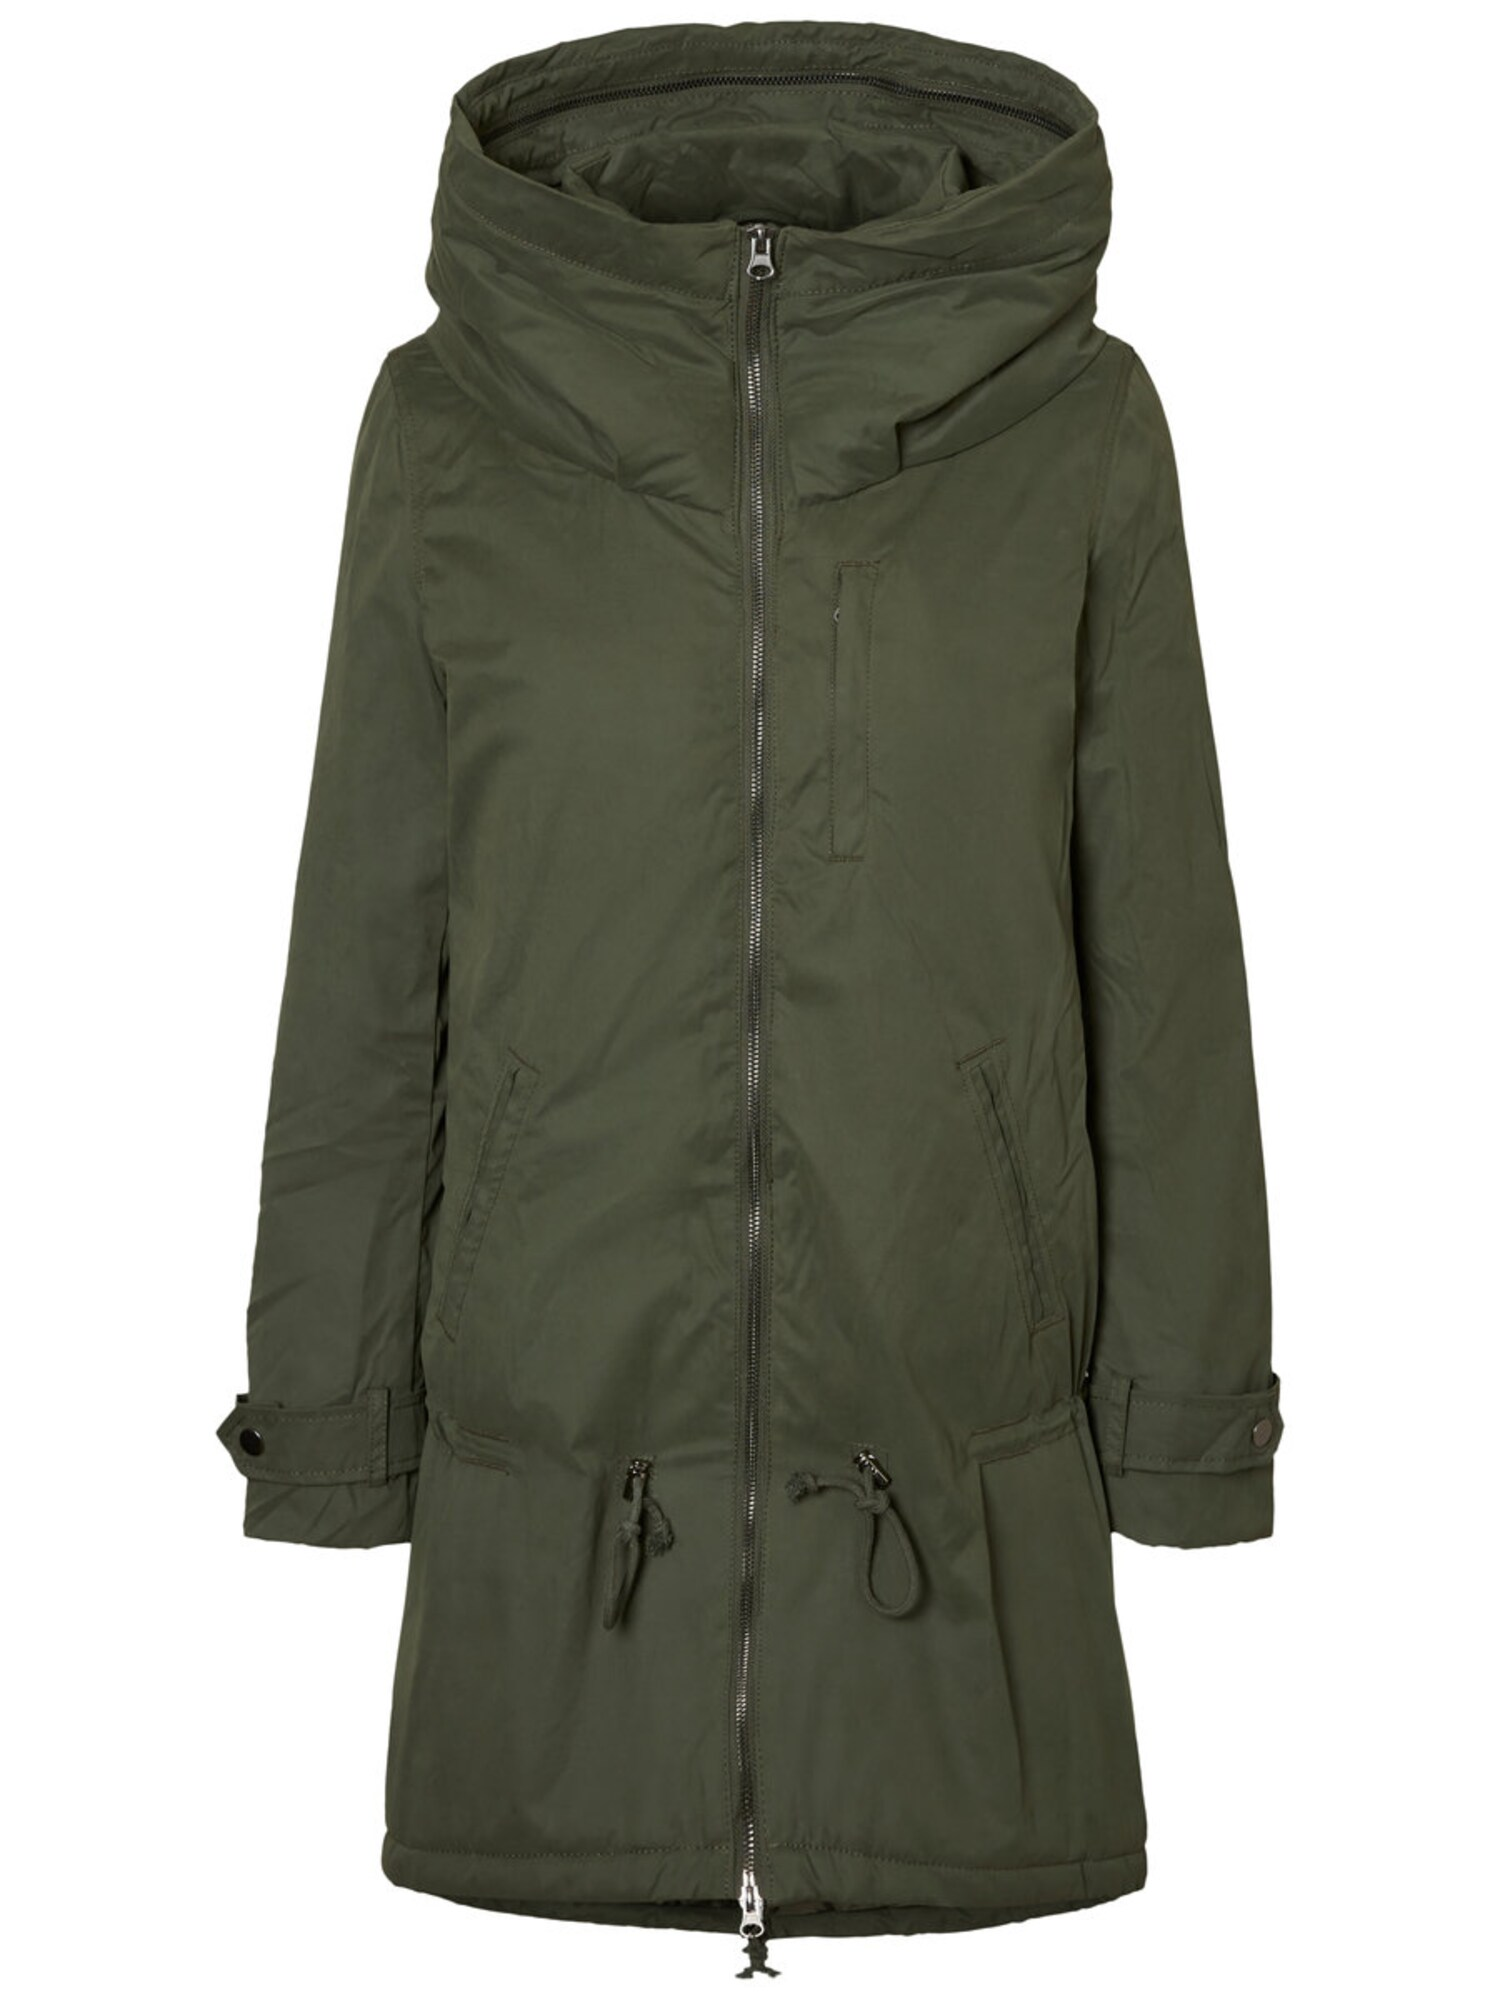 Umstandsjacke 'Gepolstert in den Winter' | Bekleidung > Umstandsmode > Umstandsjacken | Khaki | Mamalicious